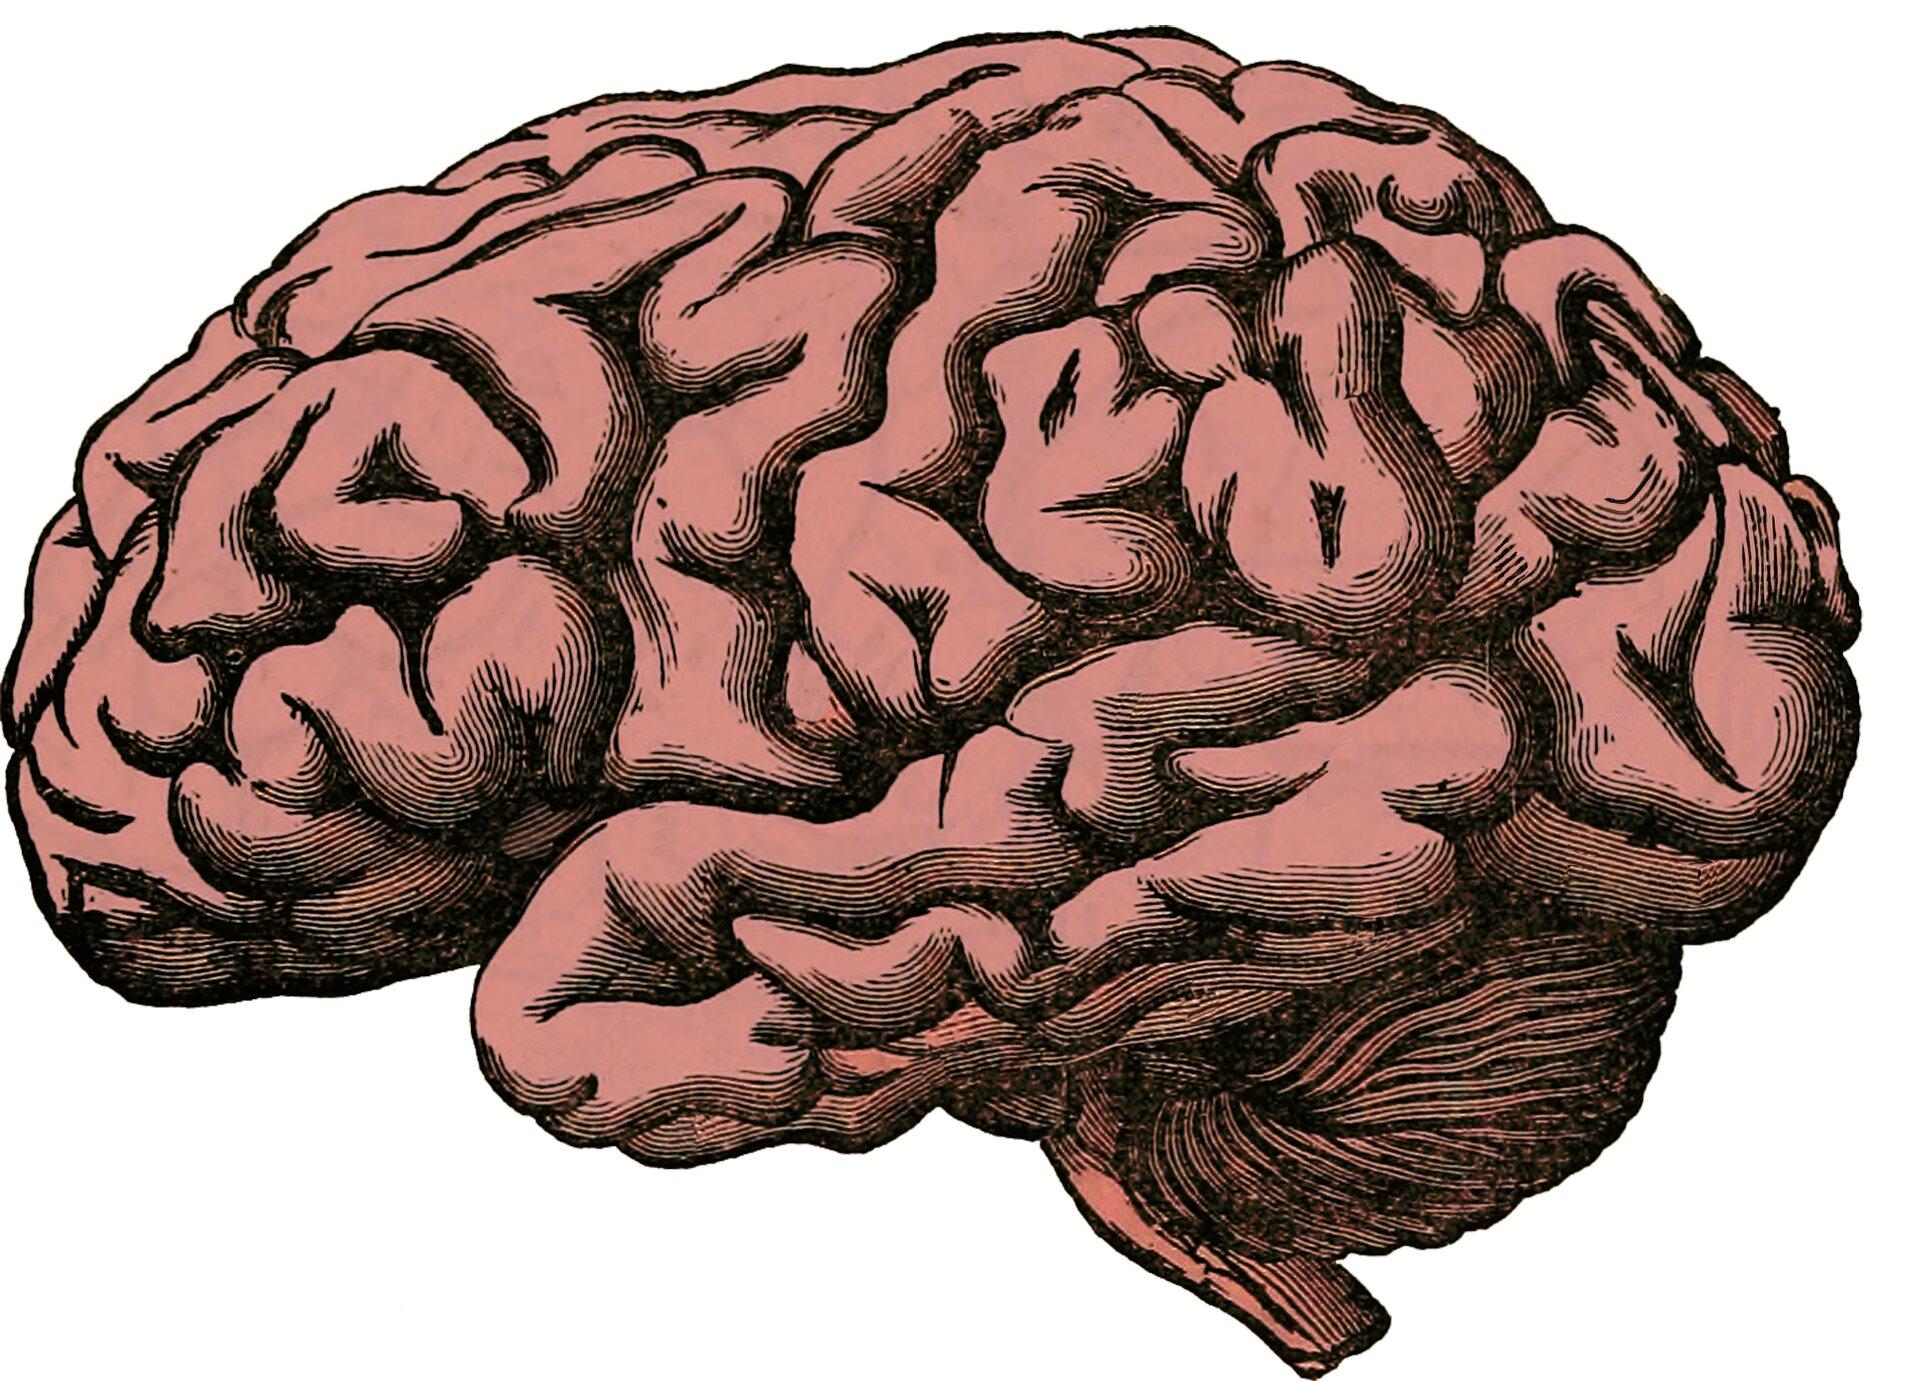 Could parasite manipulation explain human neurological evolution?